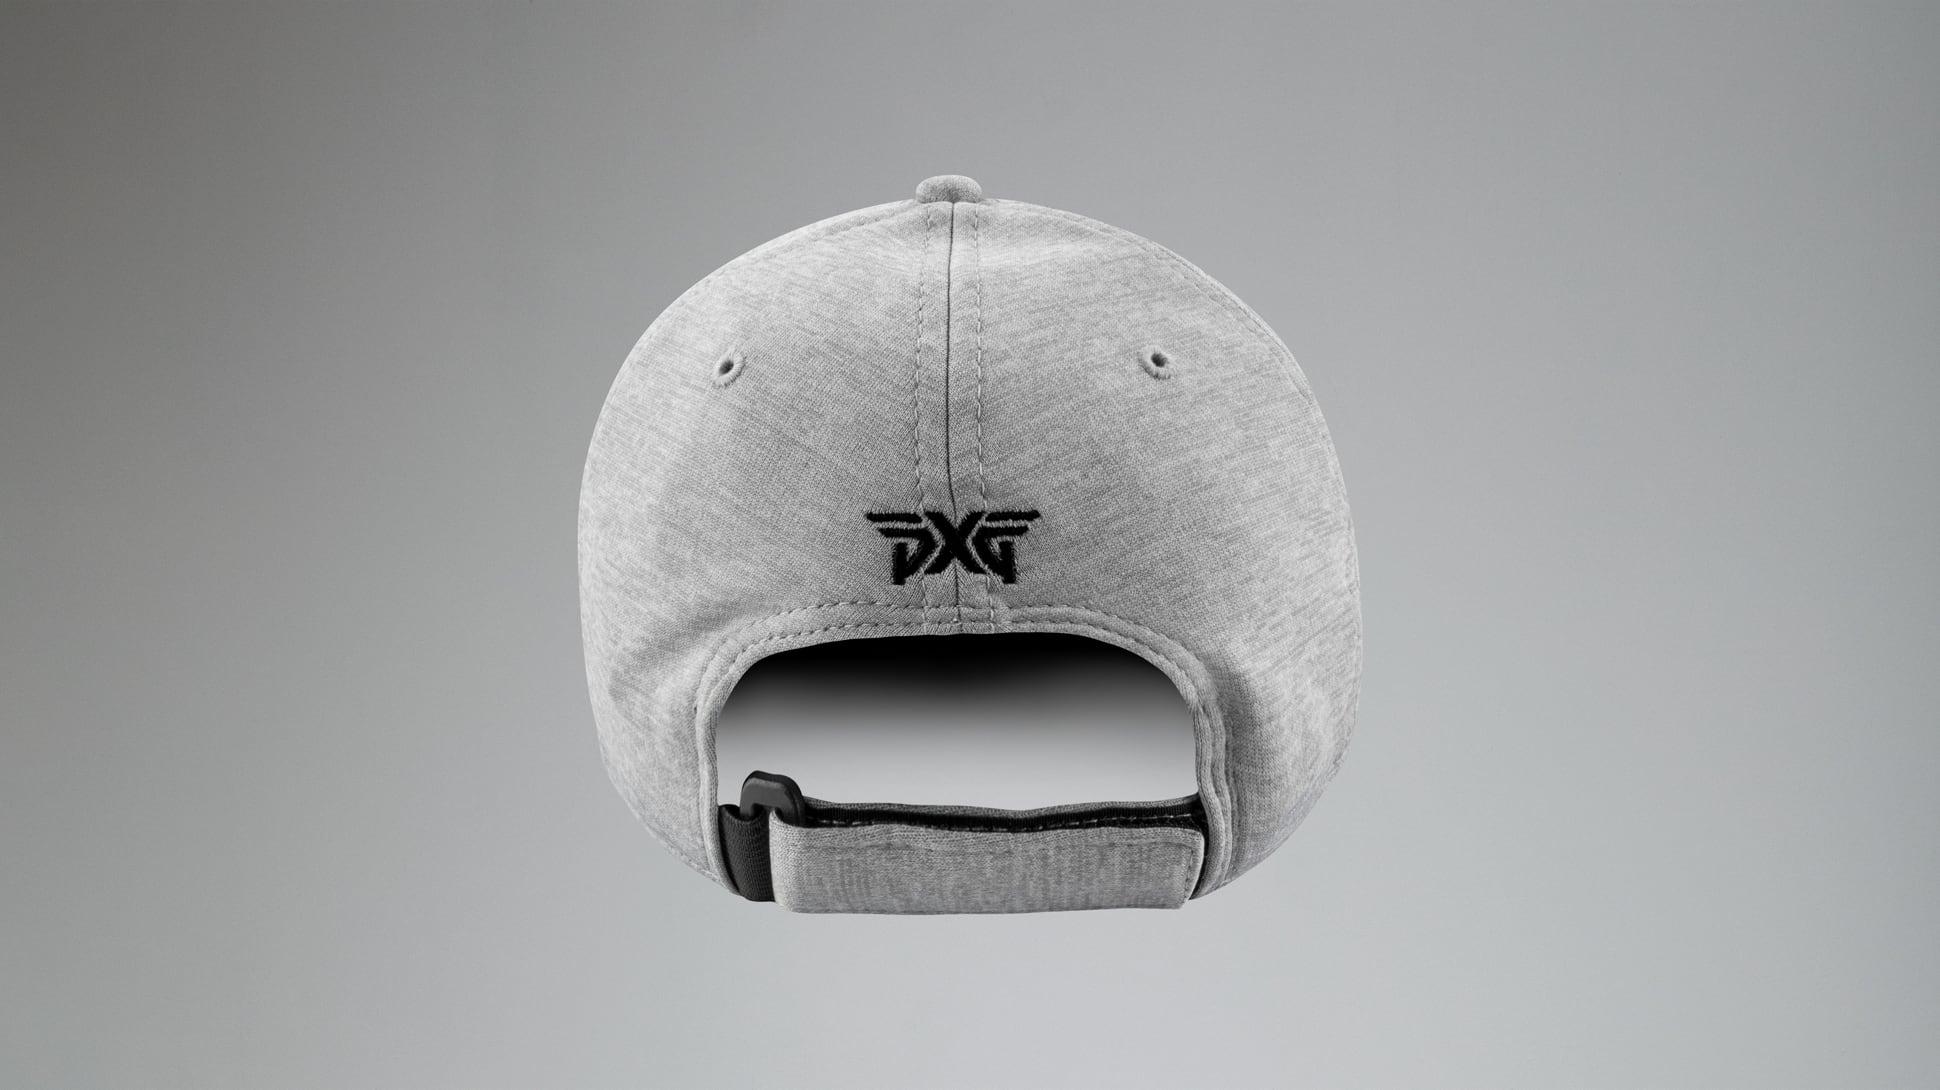 Minimalist 9FORTY Cap Image 2